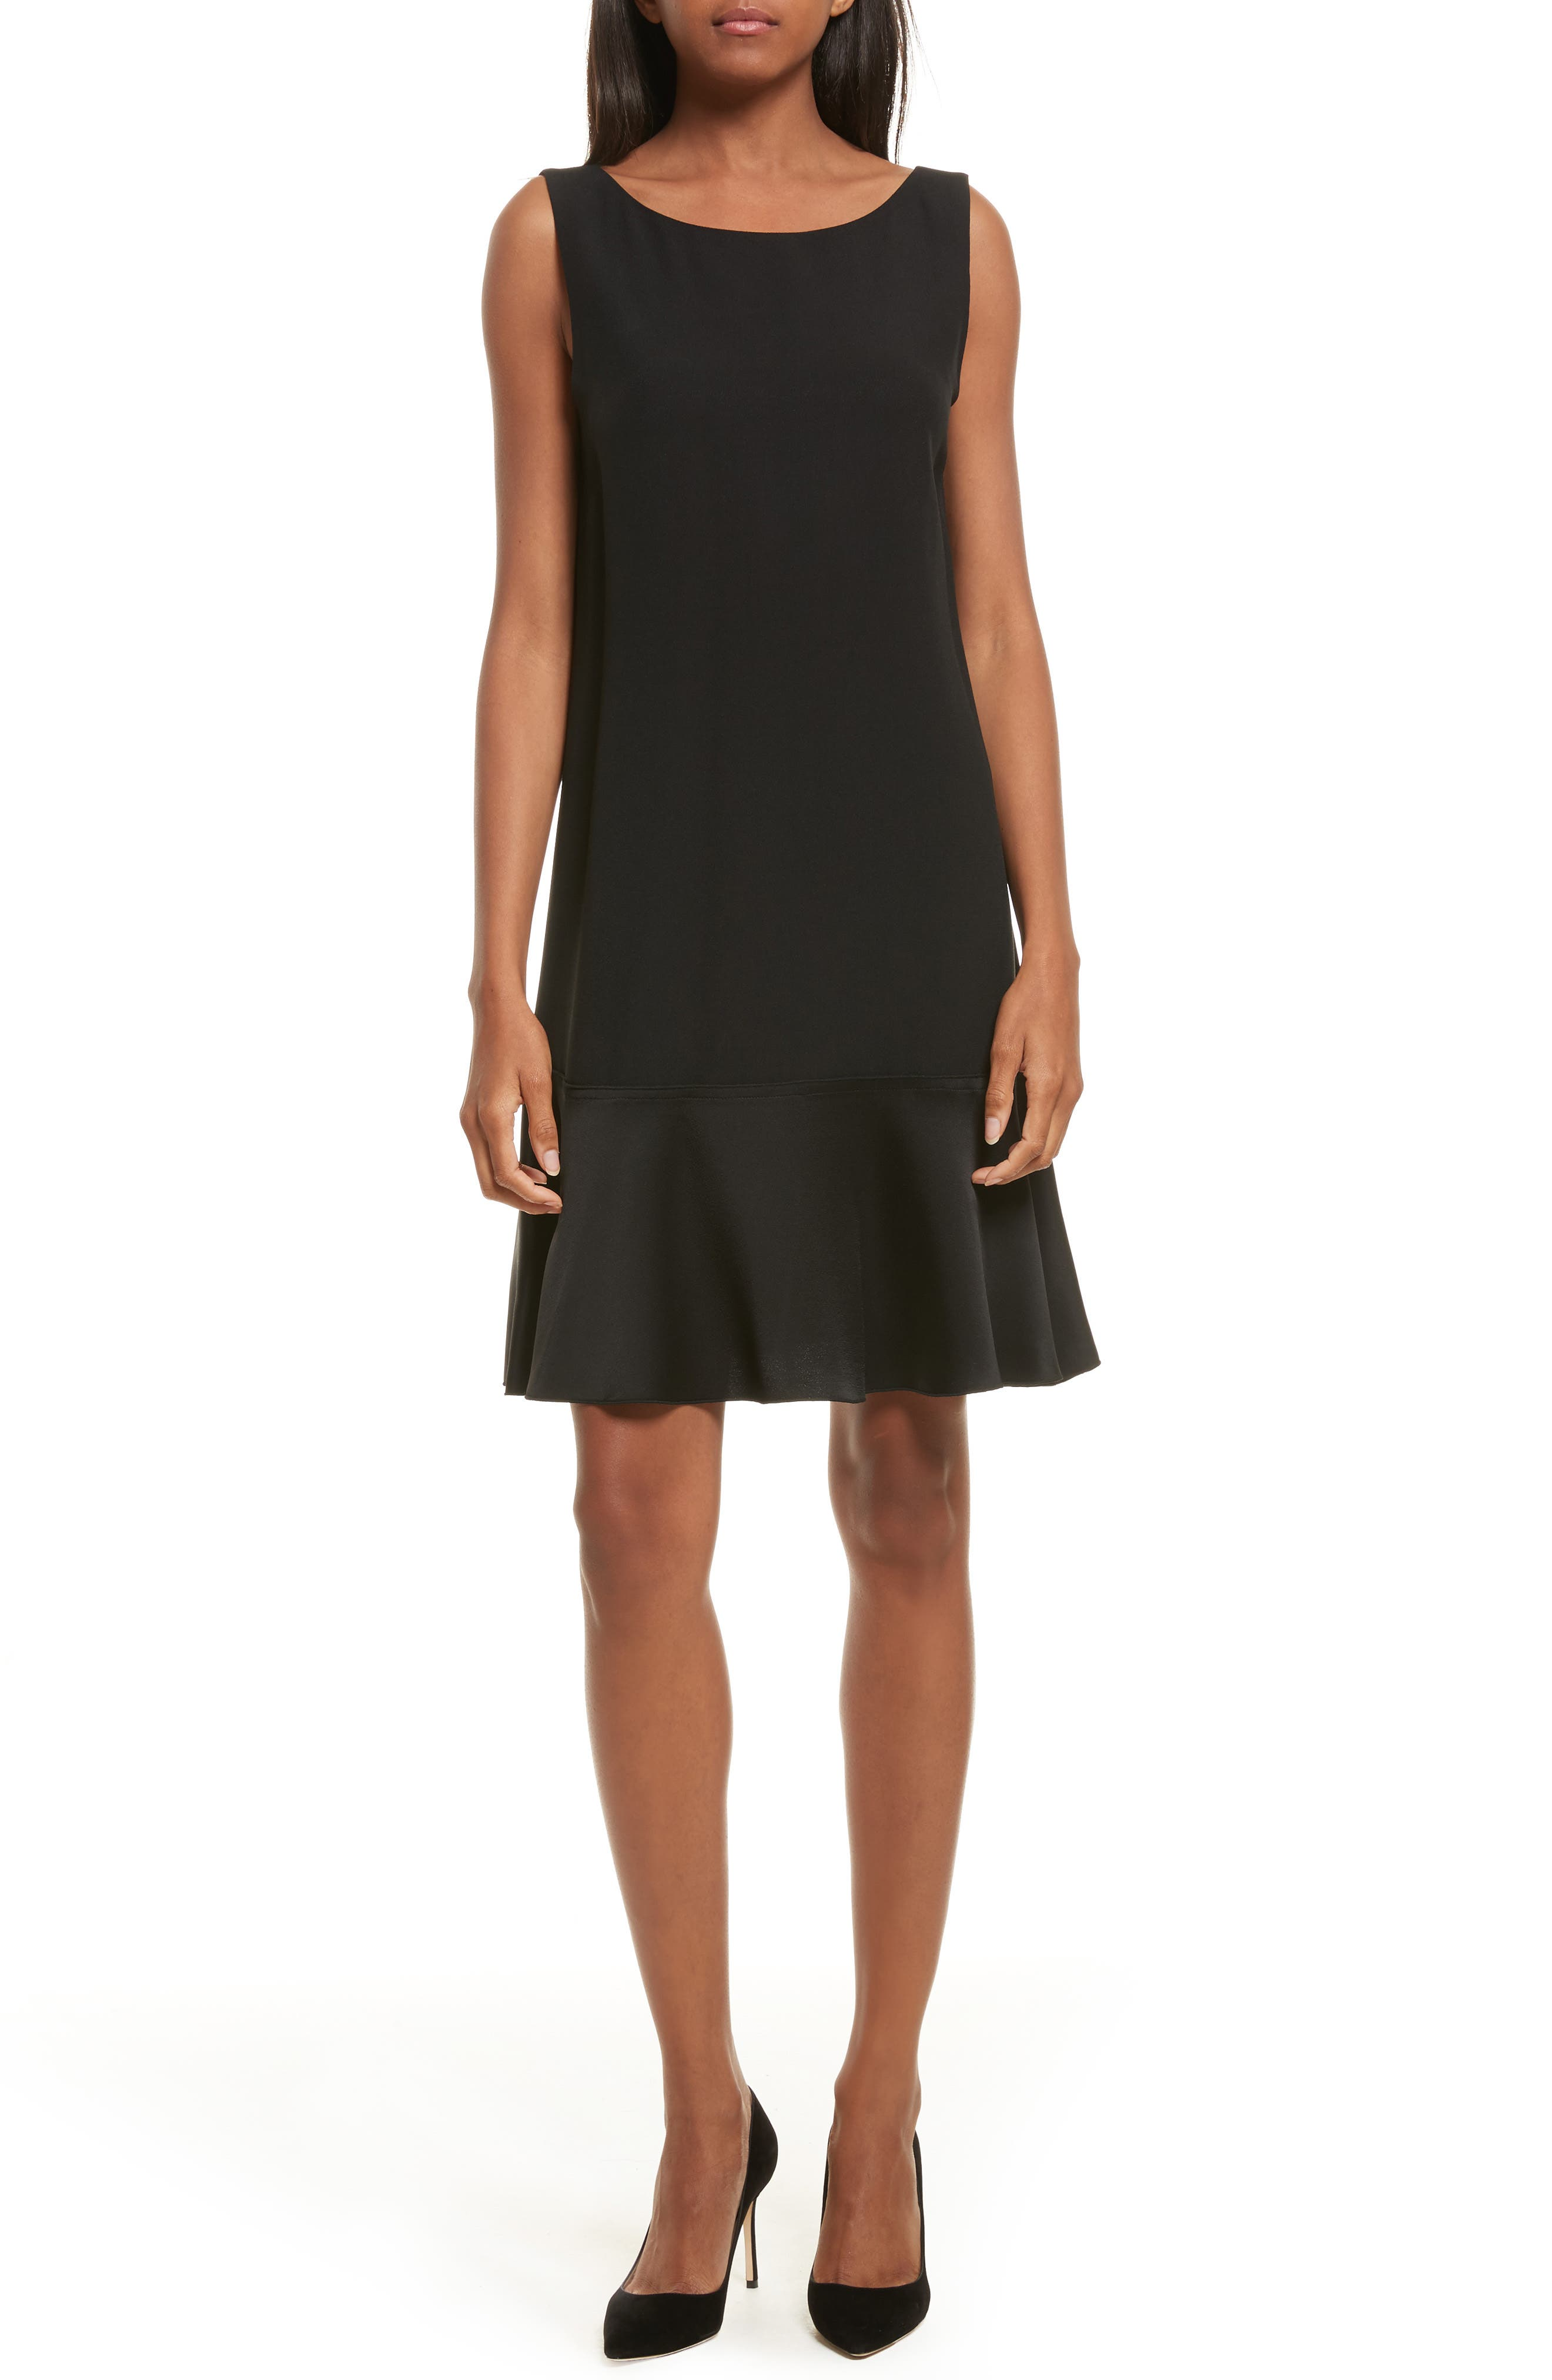 Kensington Flirty Flare Dress,                             Main thumbnail 1, color,                             Black